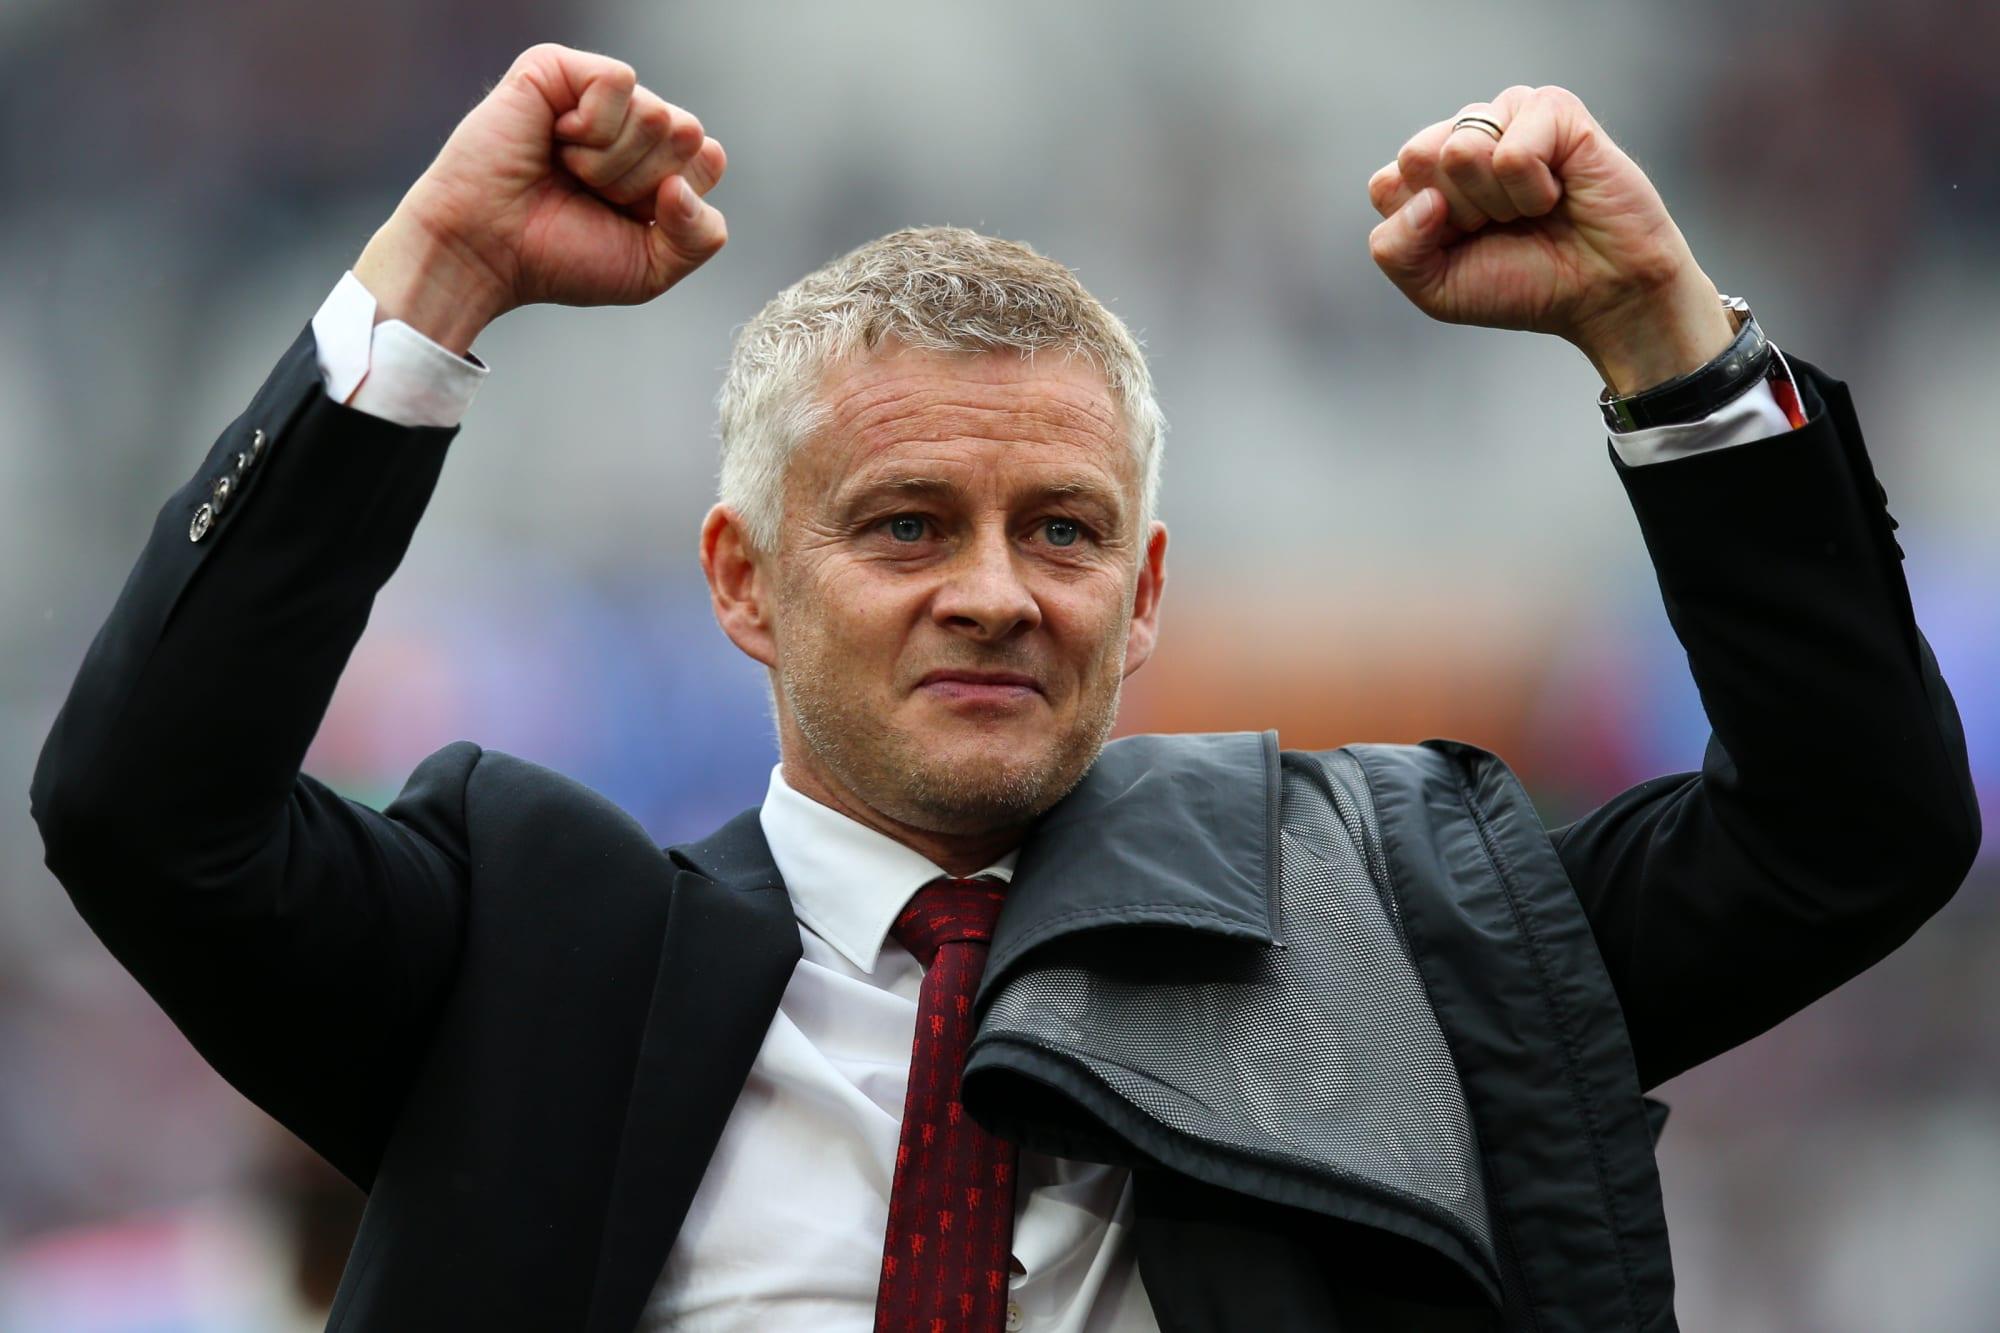 Ole Gunnar Solskjaer responds to Manchester United sack claims